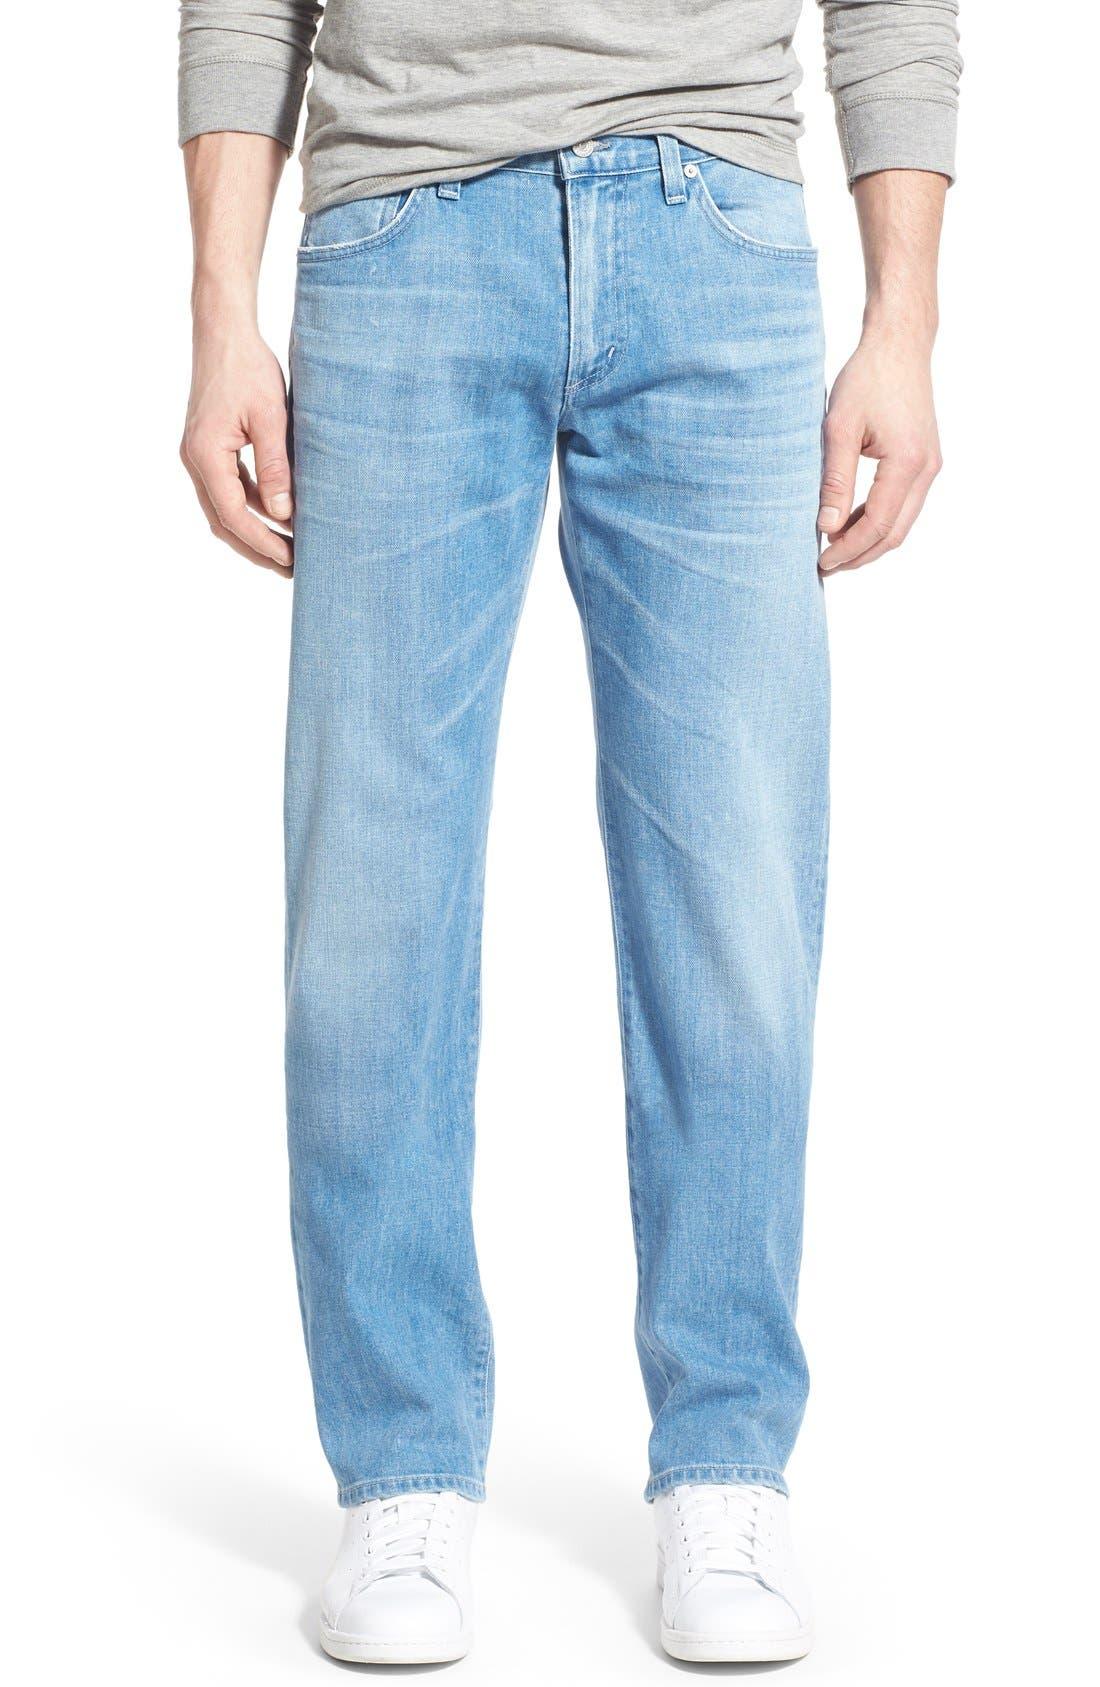 'Sid' Straight Leg Jeans,                             Main thumbnail 1, color,                             465